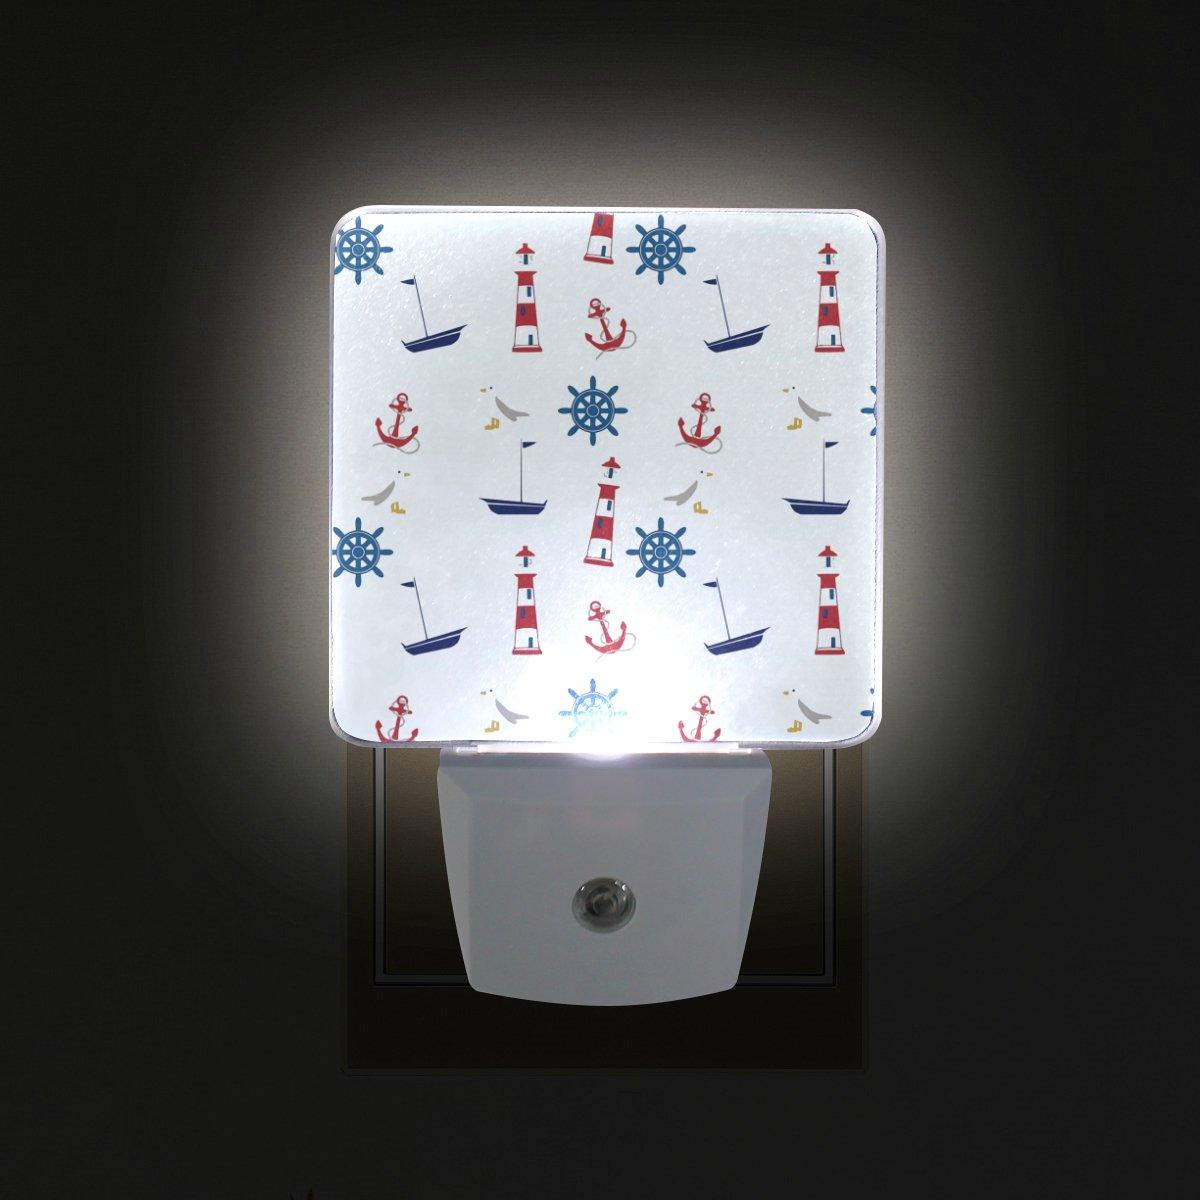 GIOVANIOR Nautical Anchor Lighthouse Plug in Dusk to Dawn Light Sensor LED Night Light Wall Light for Bedroom, Bathroom, Hallway, Stairs, Energy Efficient